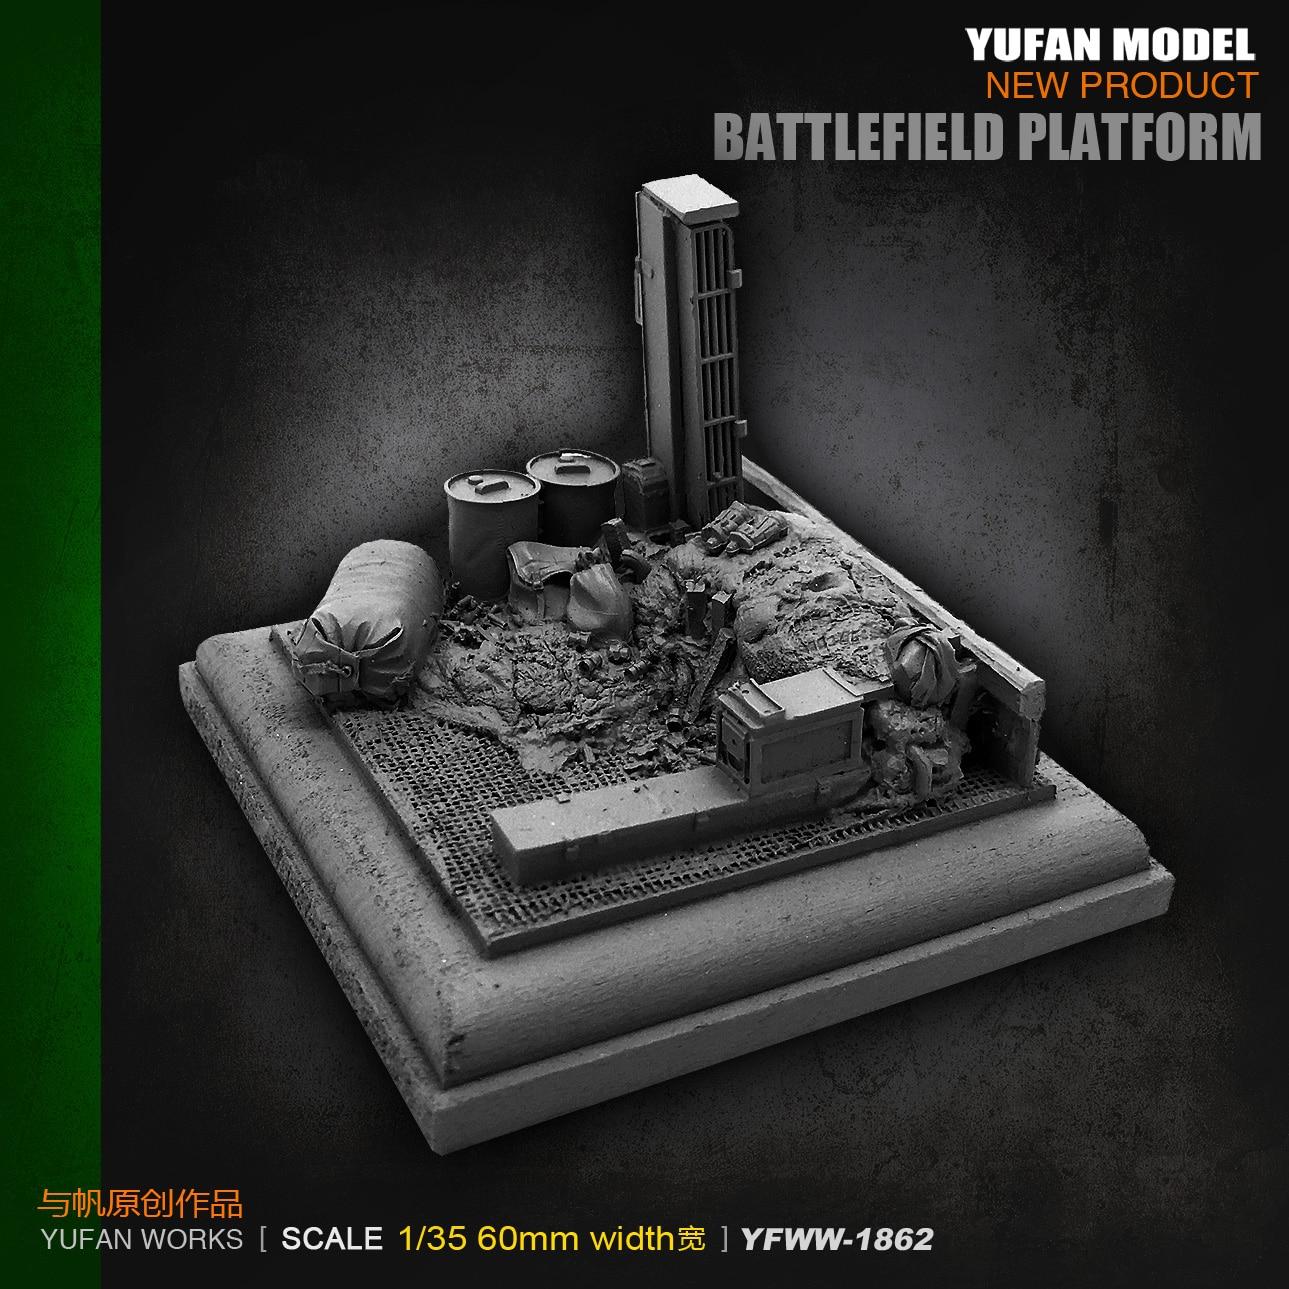 Yufan Model  Original 1/35 60mm Wide Resin Soldier Platform YFWW35-1862